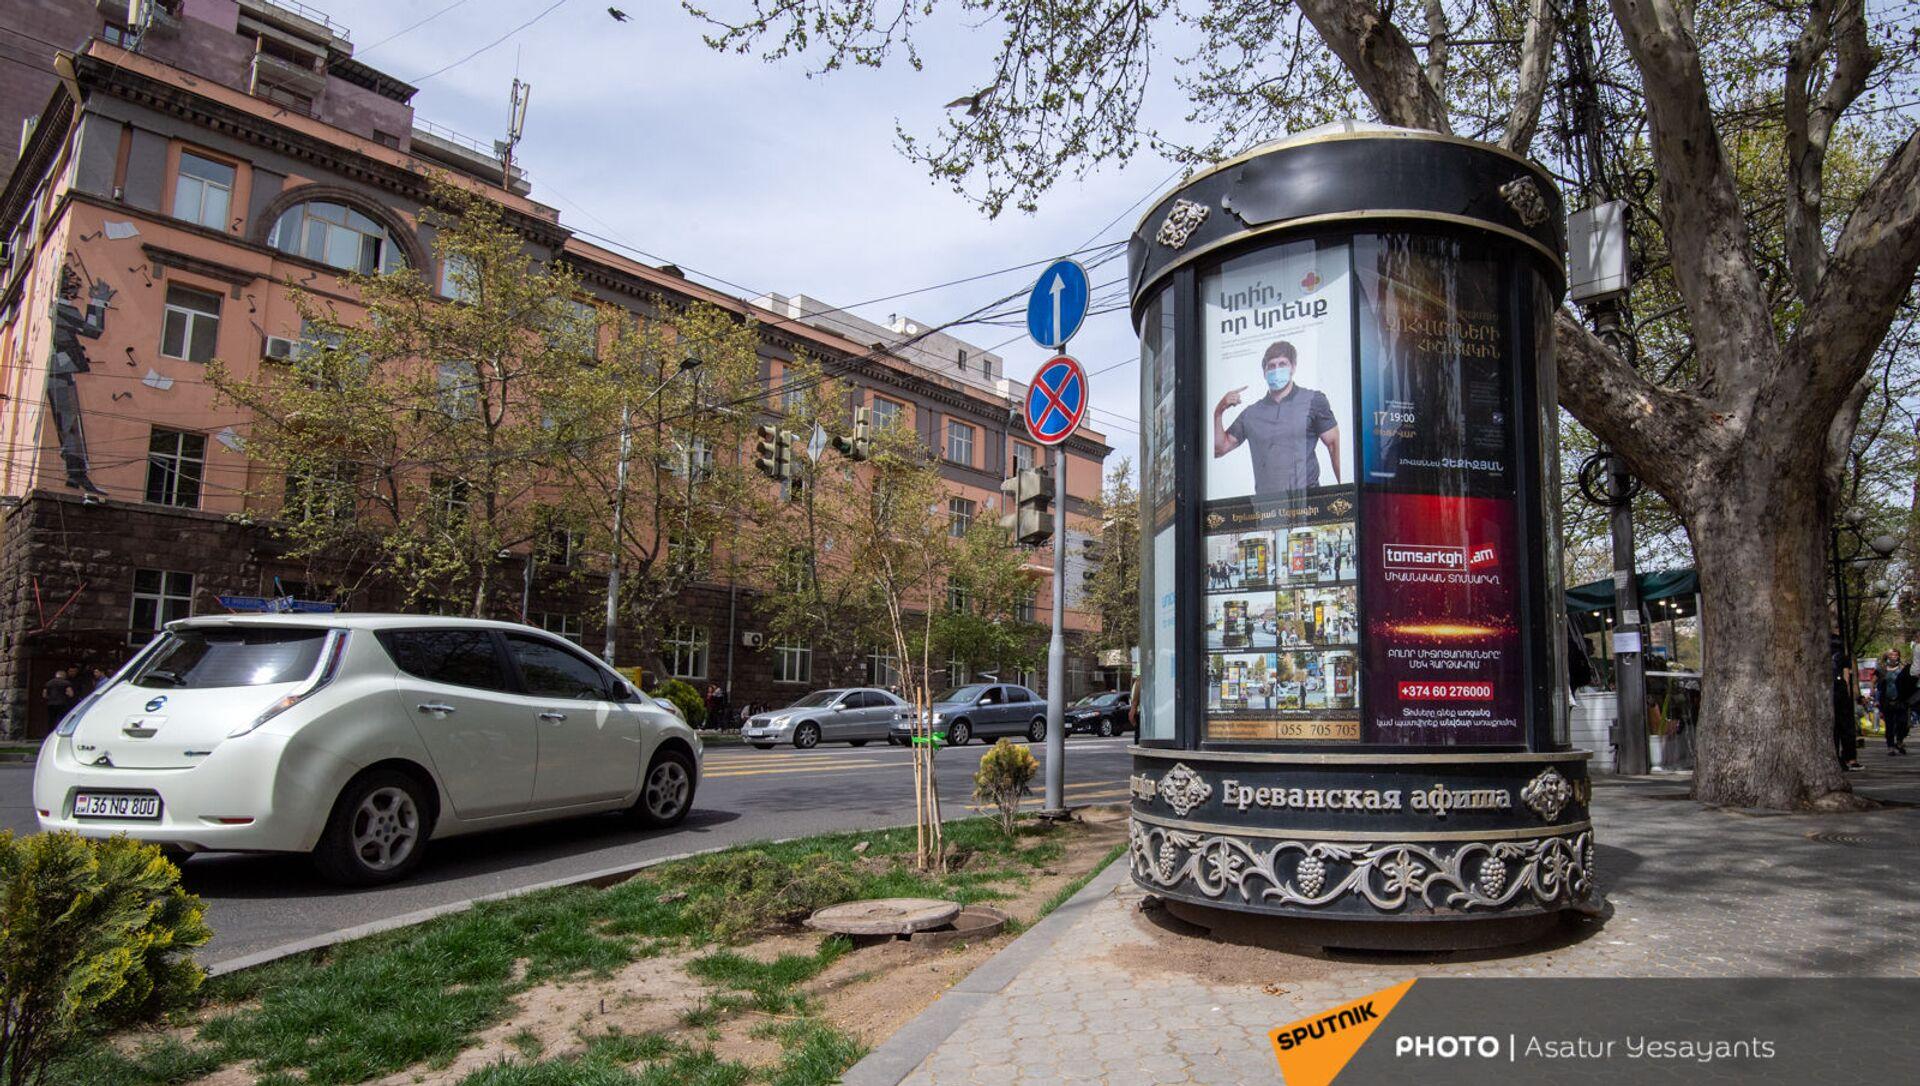 Тумба для анонсов и афиш компании Outdoor effect в Ереване - Sputnik Армения, 1920, 27.04.2021